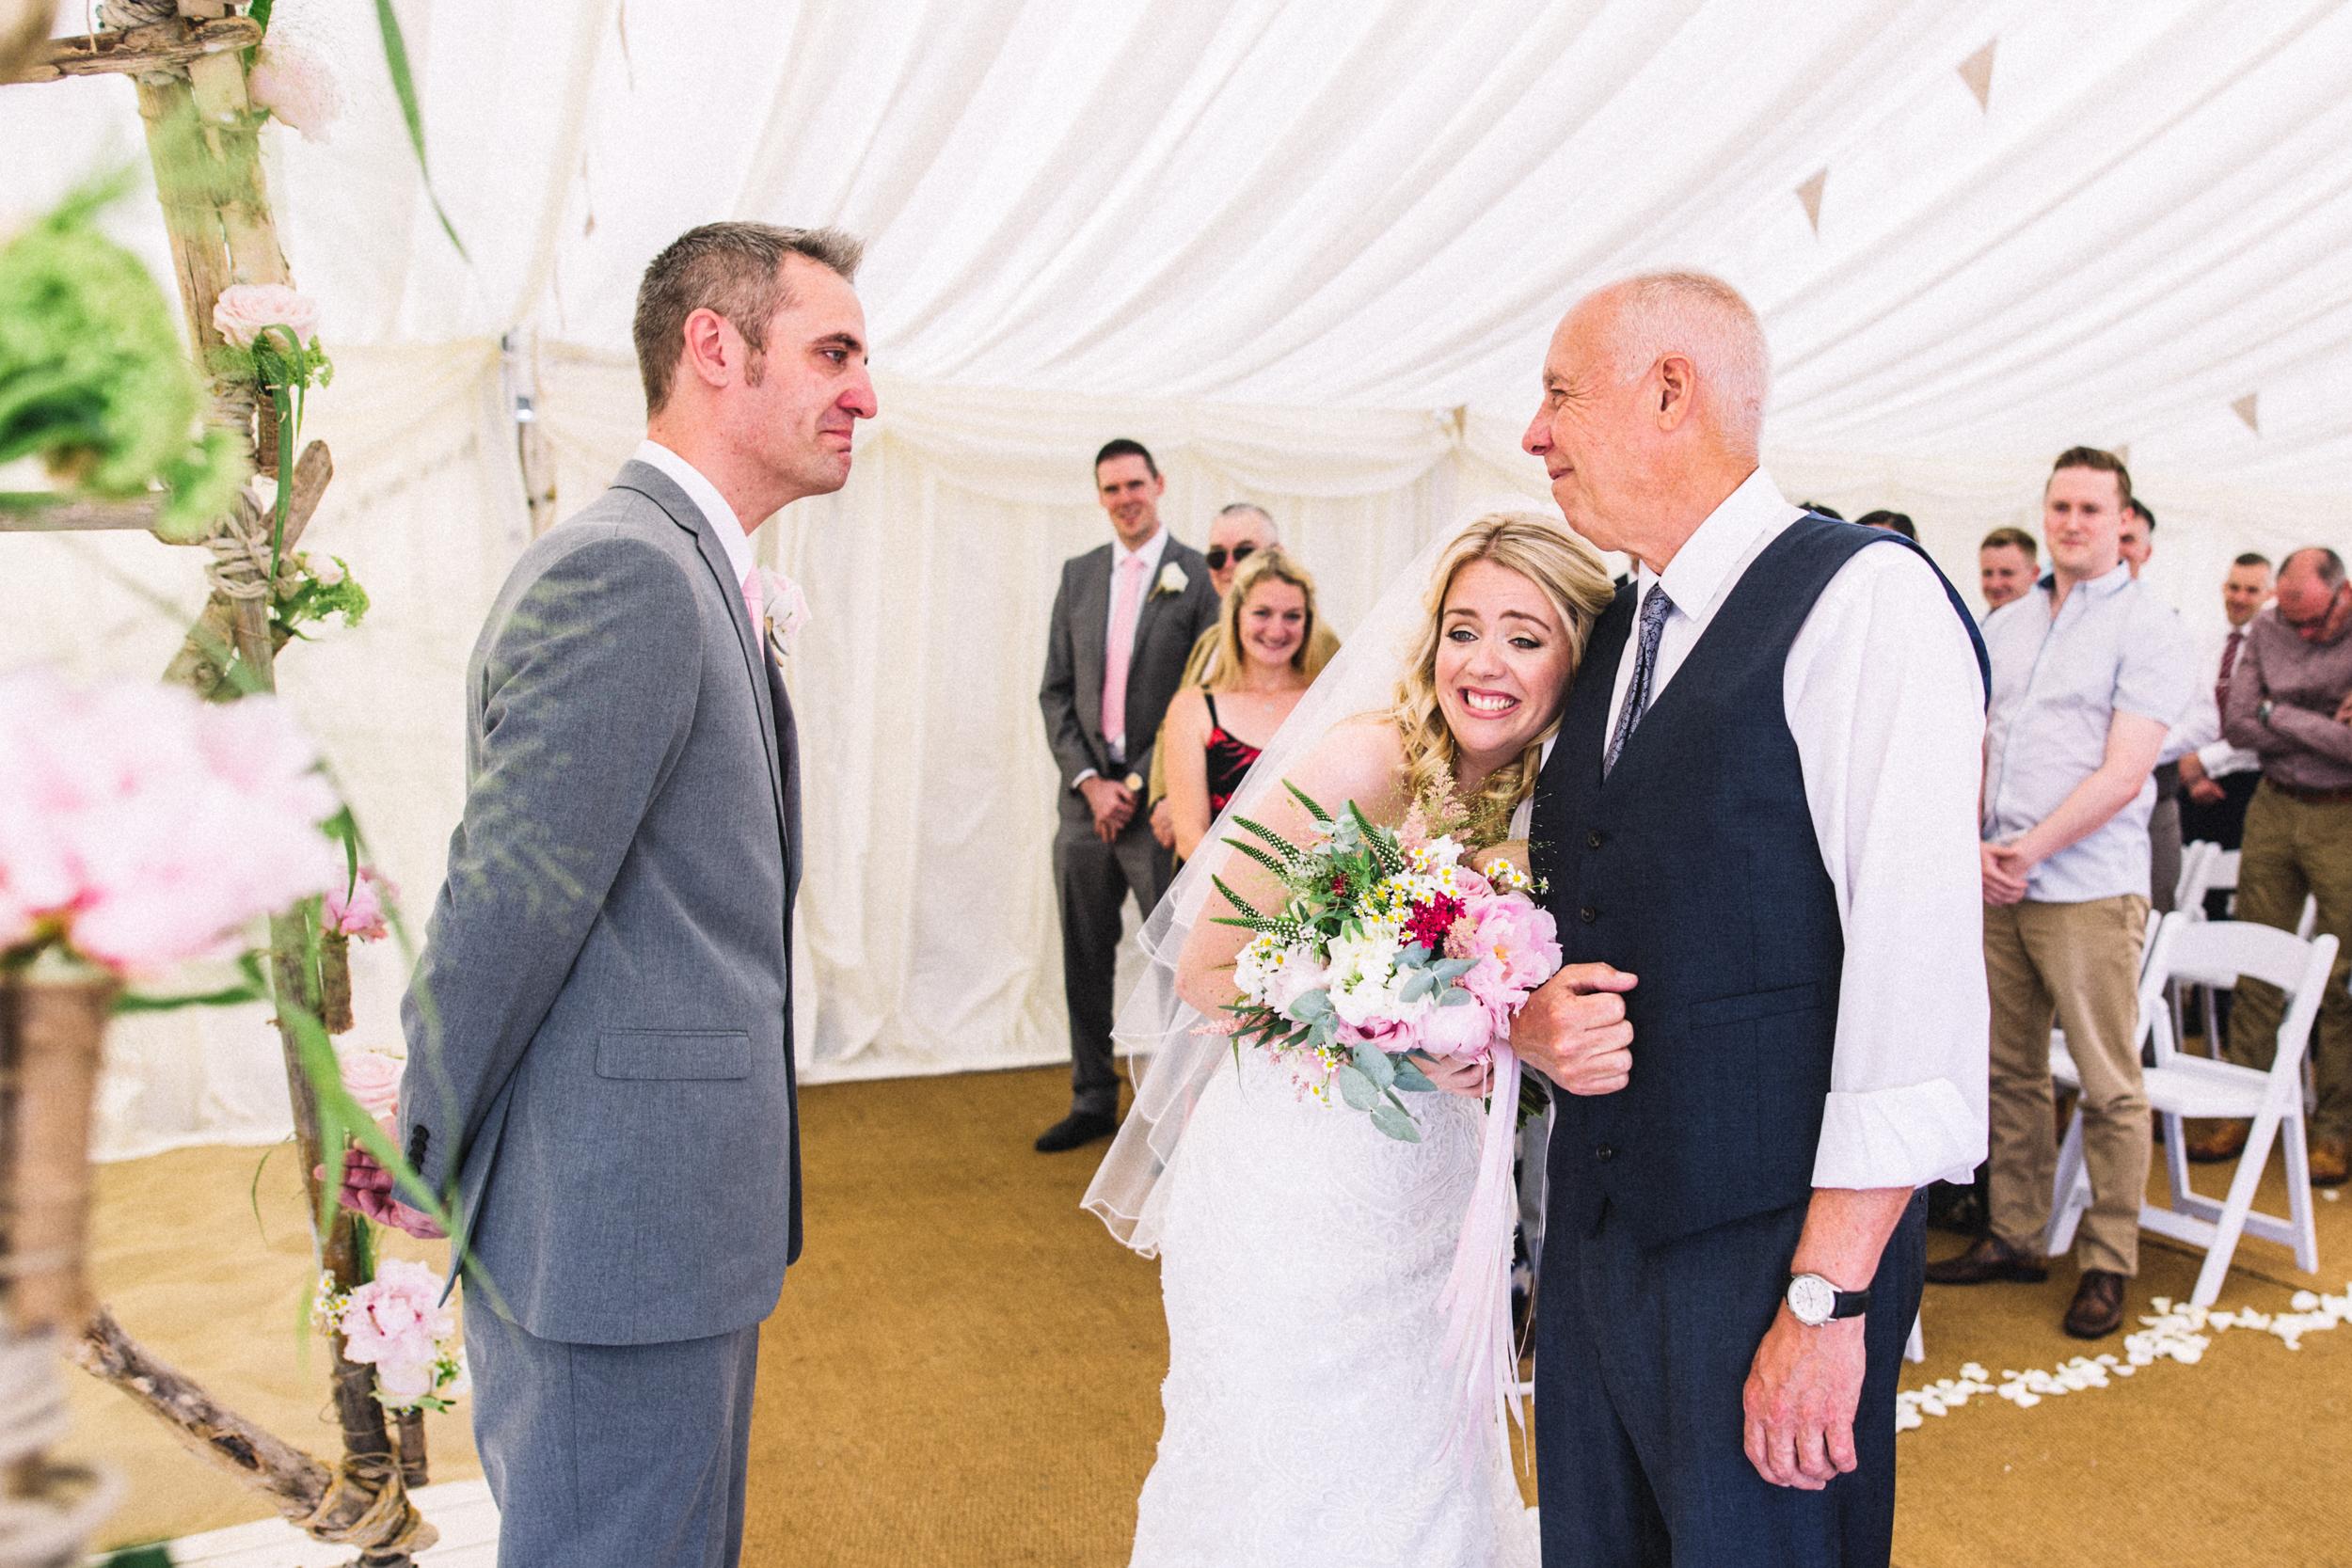 creative-wedding-photography-teesside-north-east-yorkshire-88.jpg